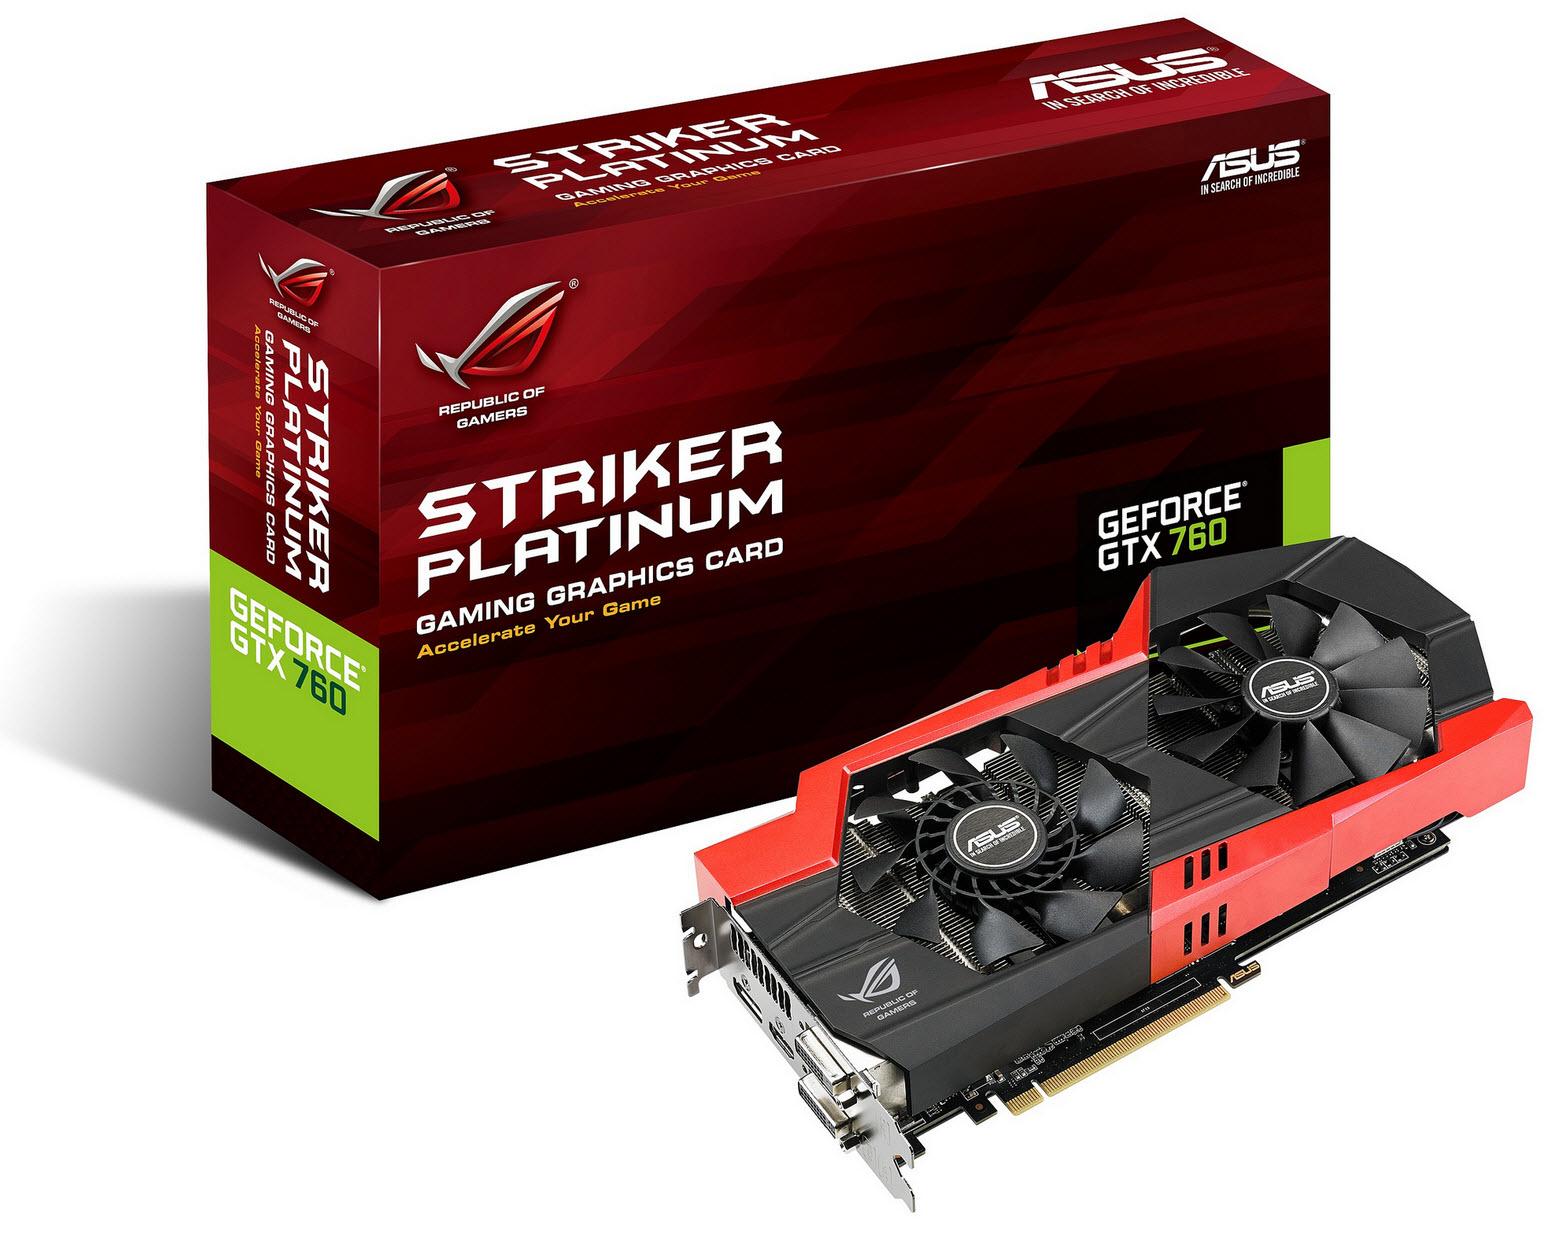 Une ROG Striker GTX 760 Platinum...abordable ?